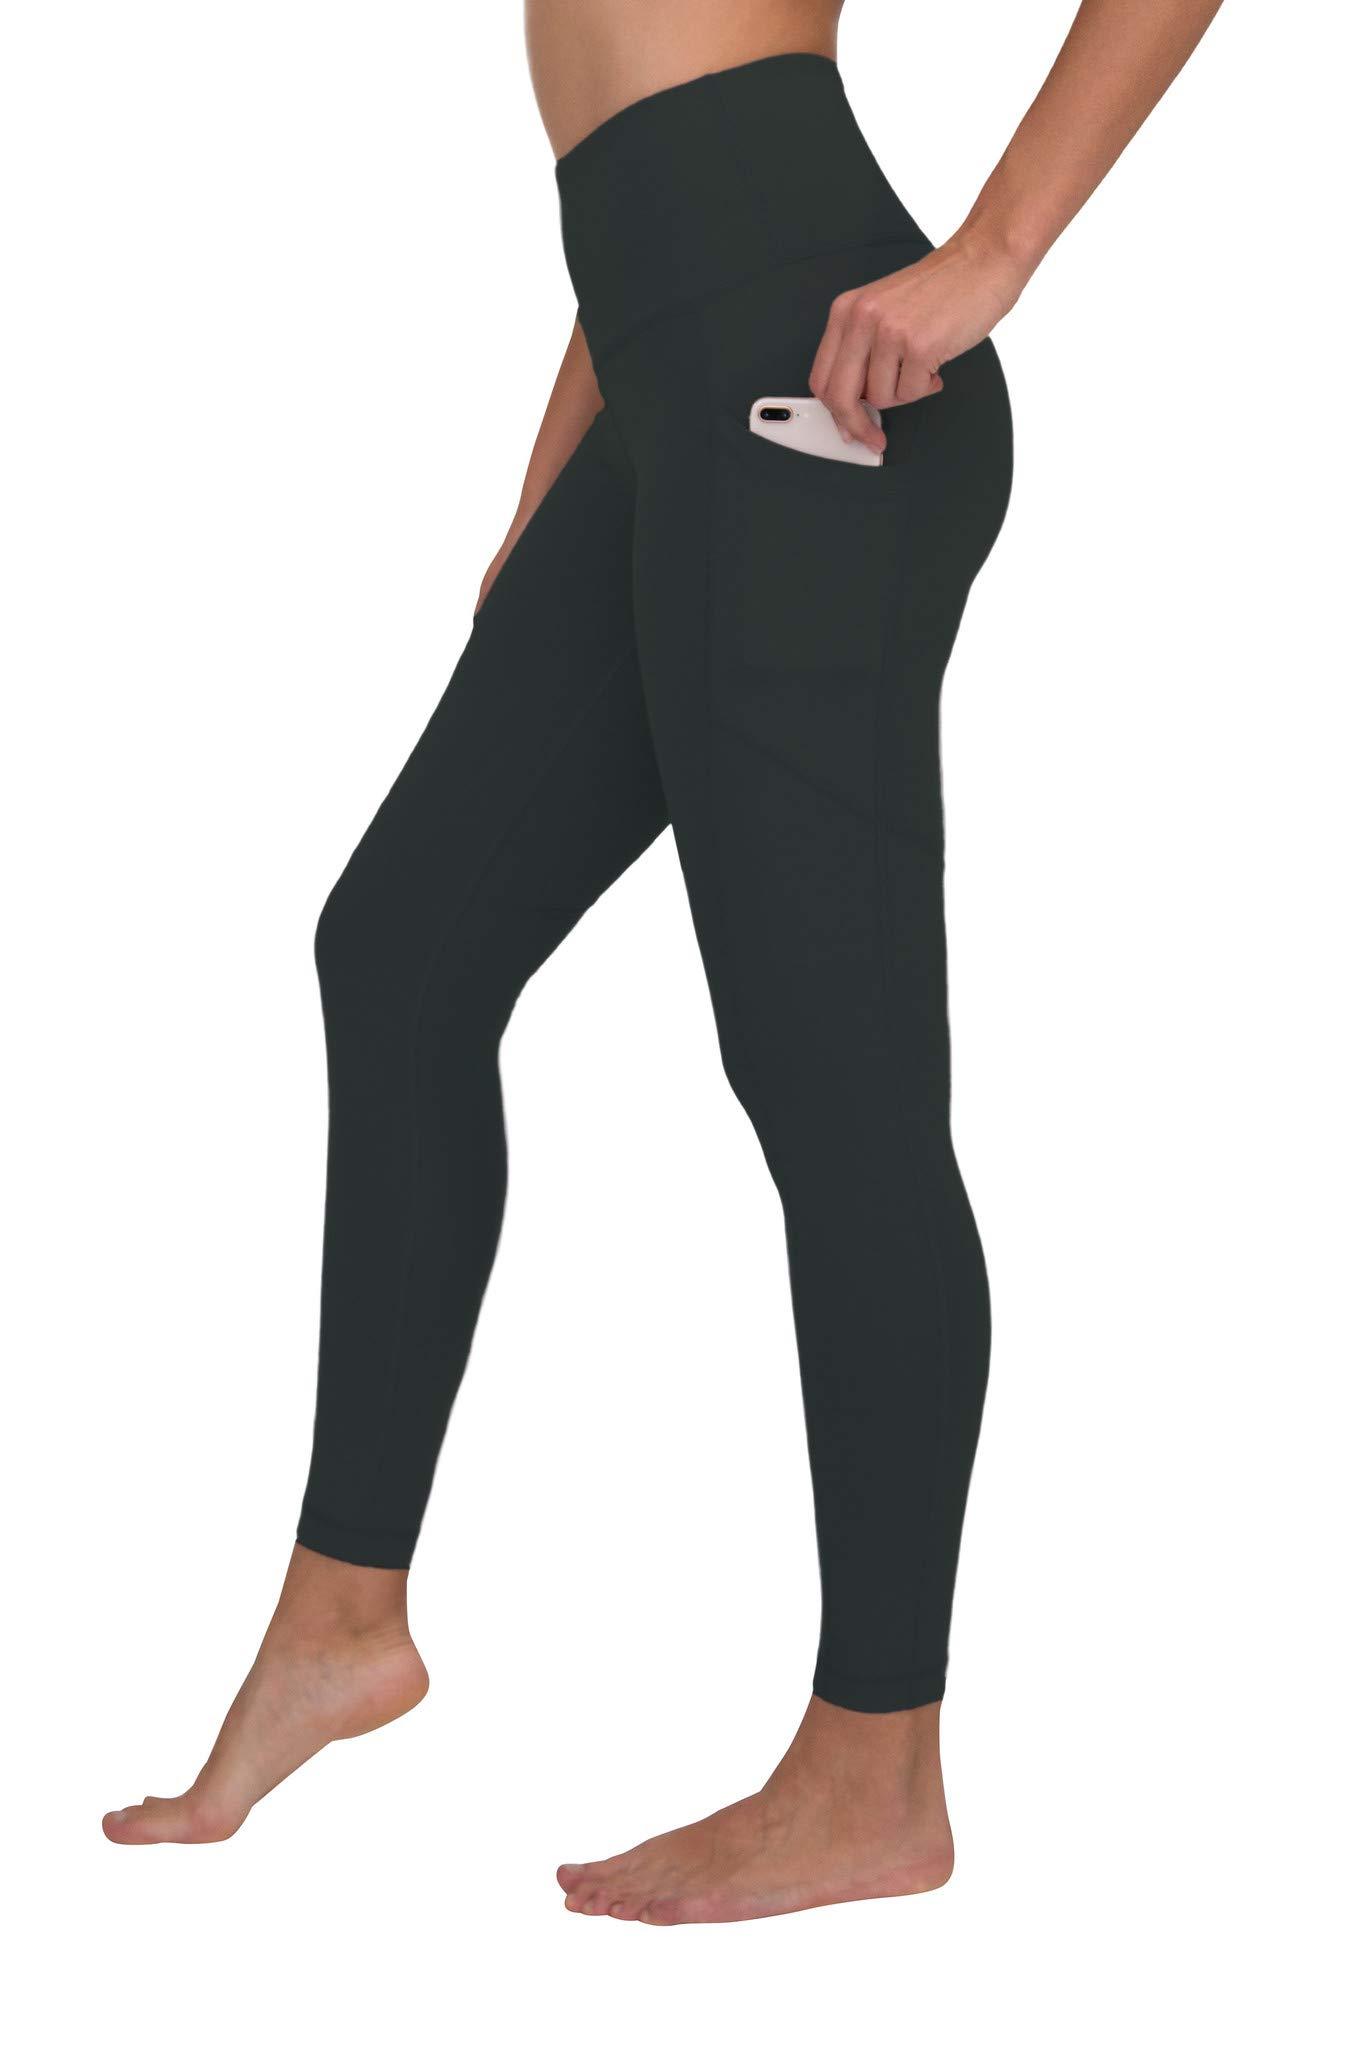 90 Degree By Reflex Women's Power Flex Yoga Pants - Spring Teal - XL by 90 Degree By Reflex